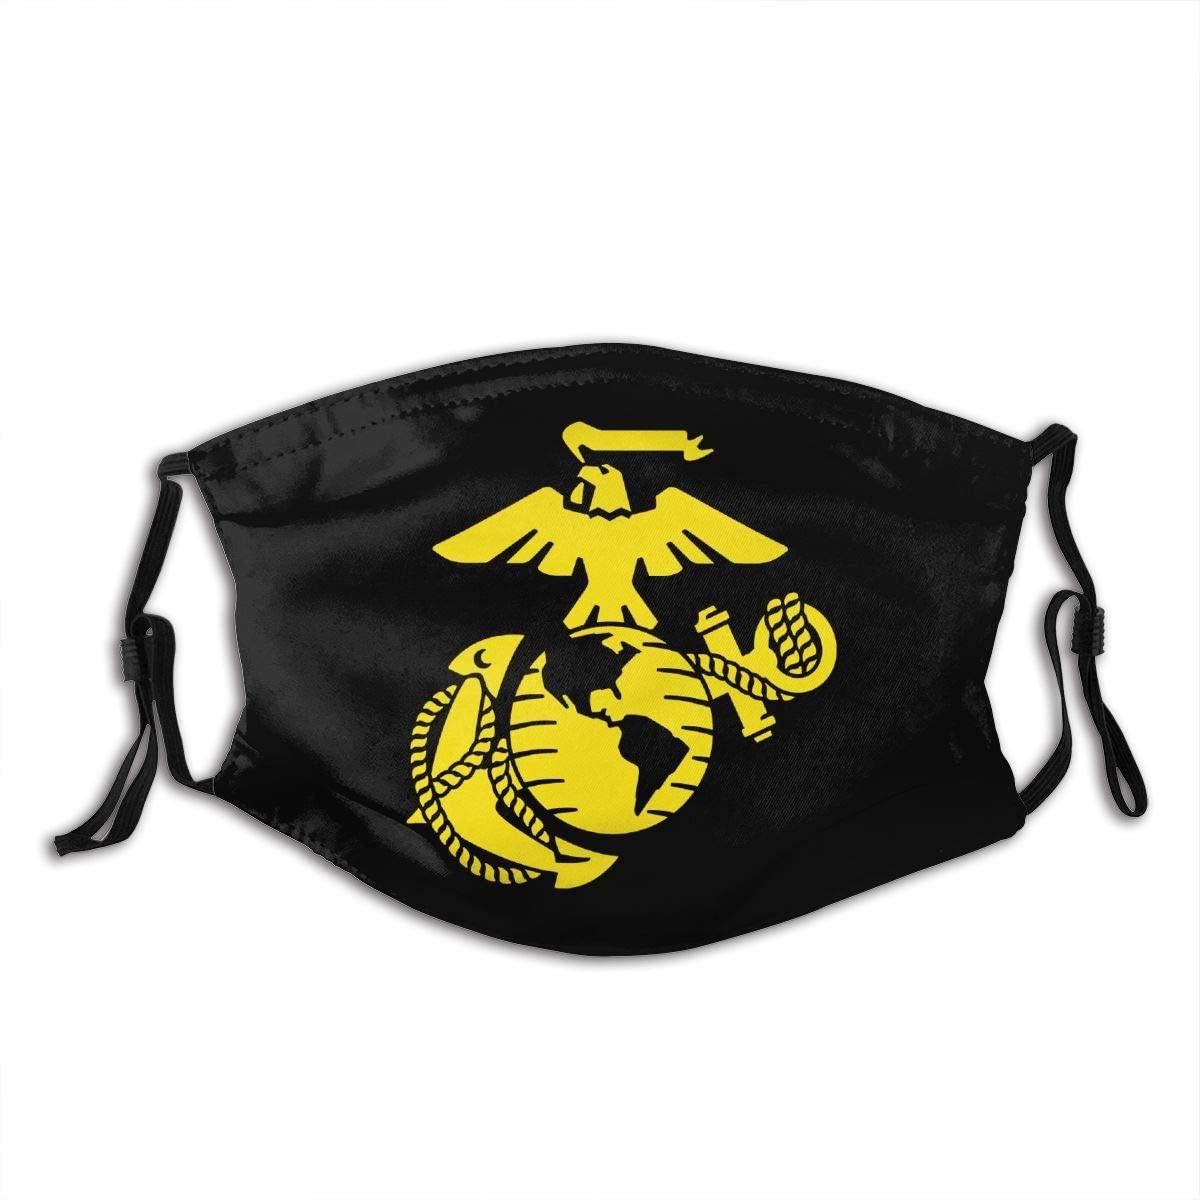 USMC Marine Logo Outdoor Mask,Protective 5-Layer Activated Carbon Filters Adult Men Women Bandana